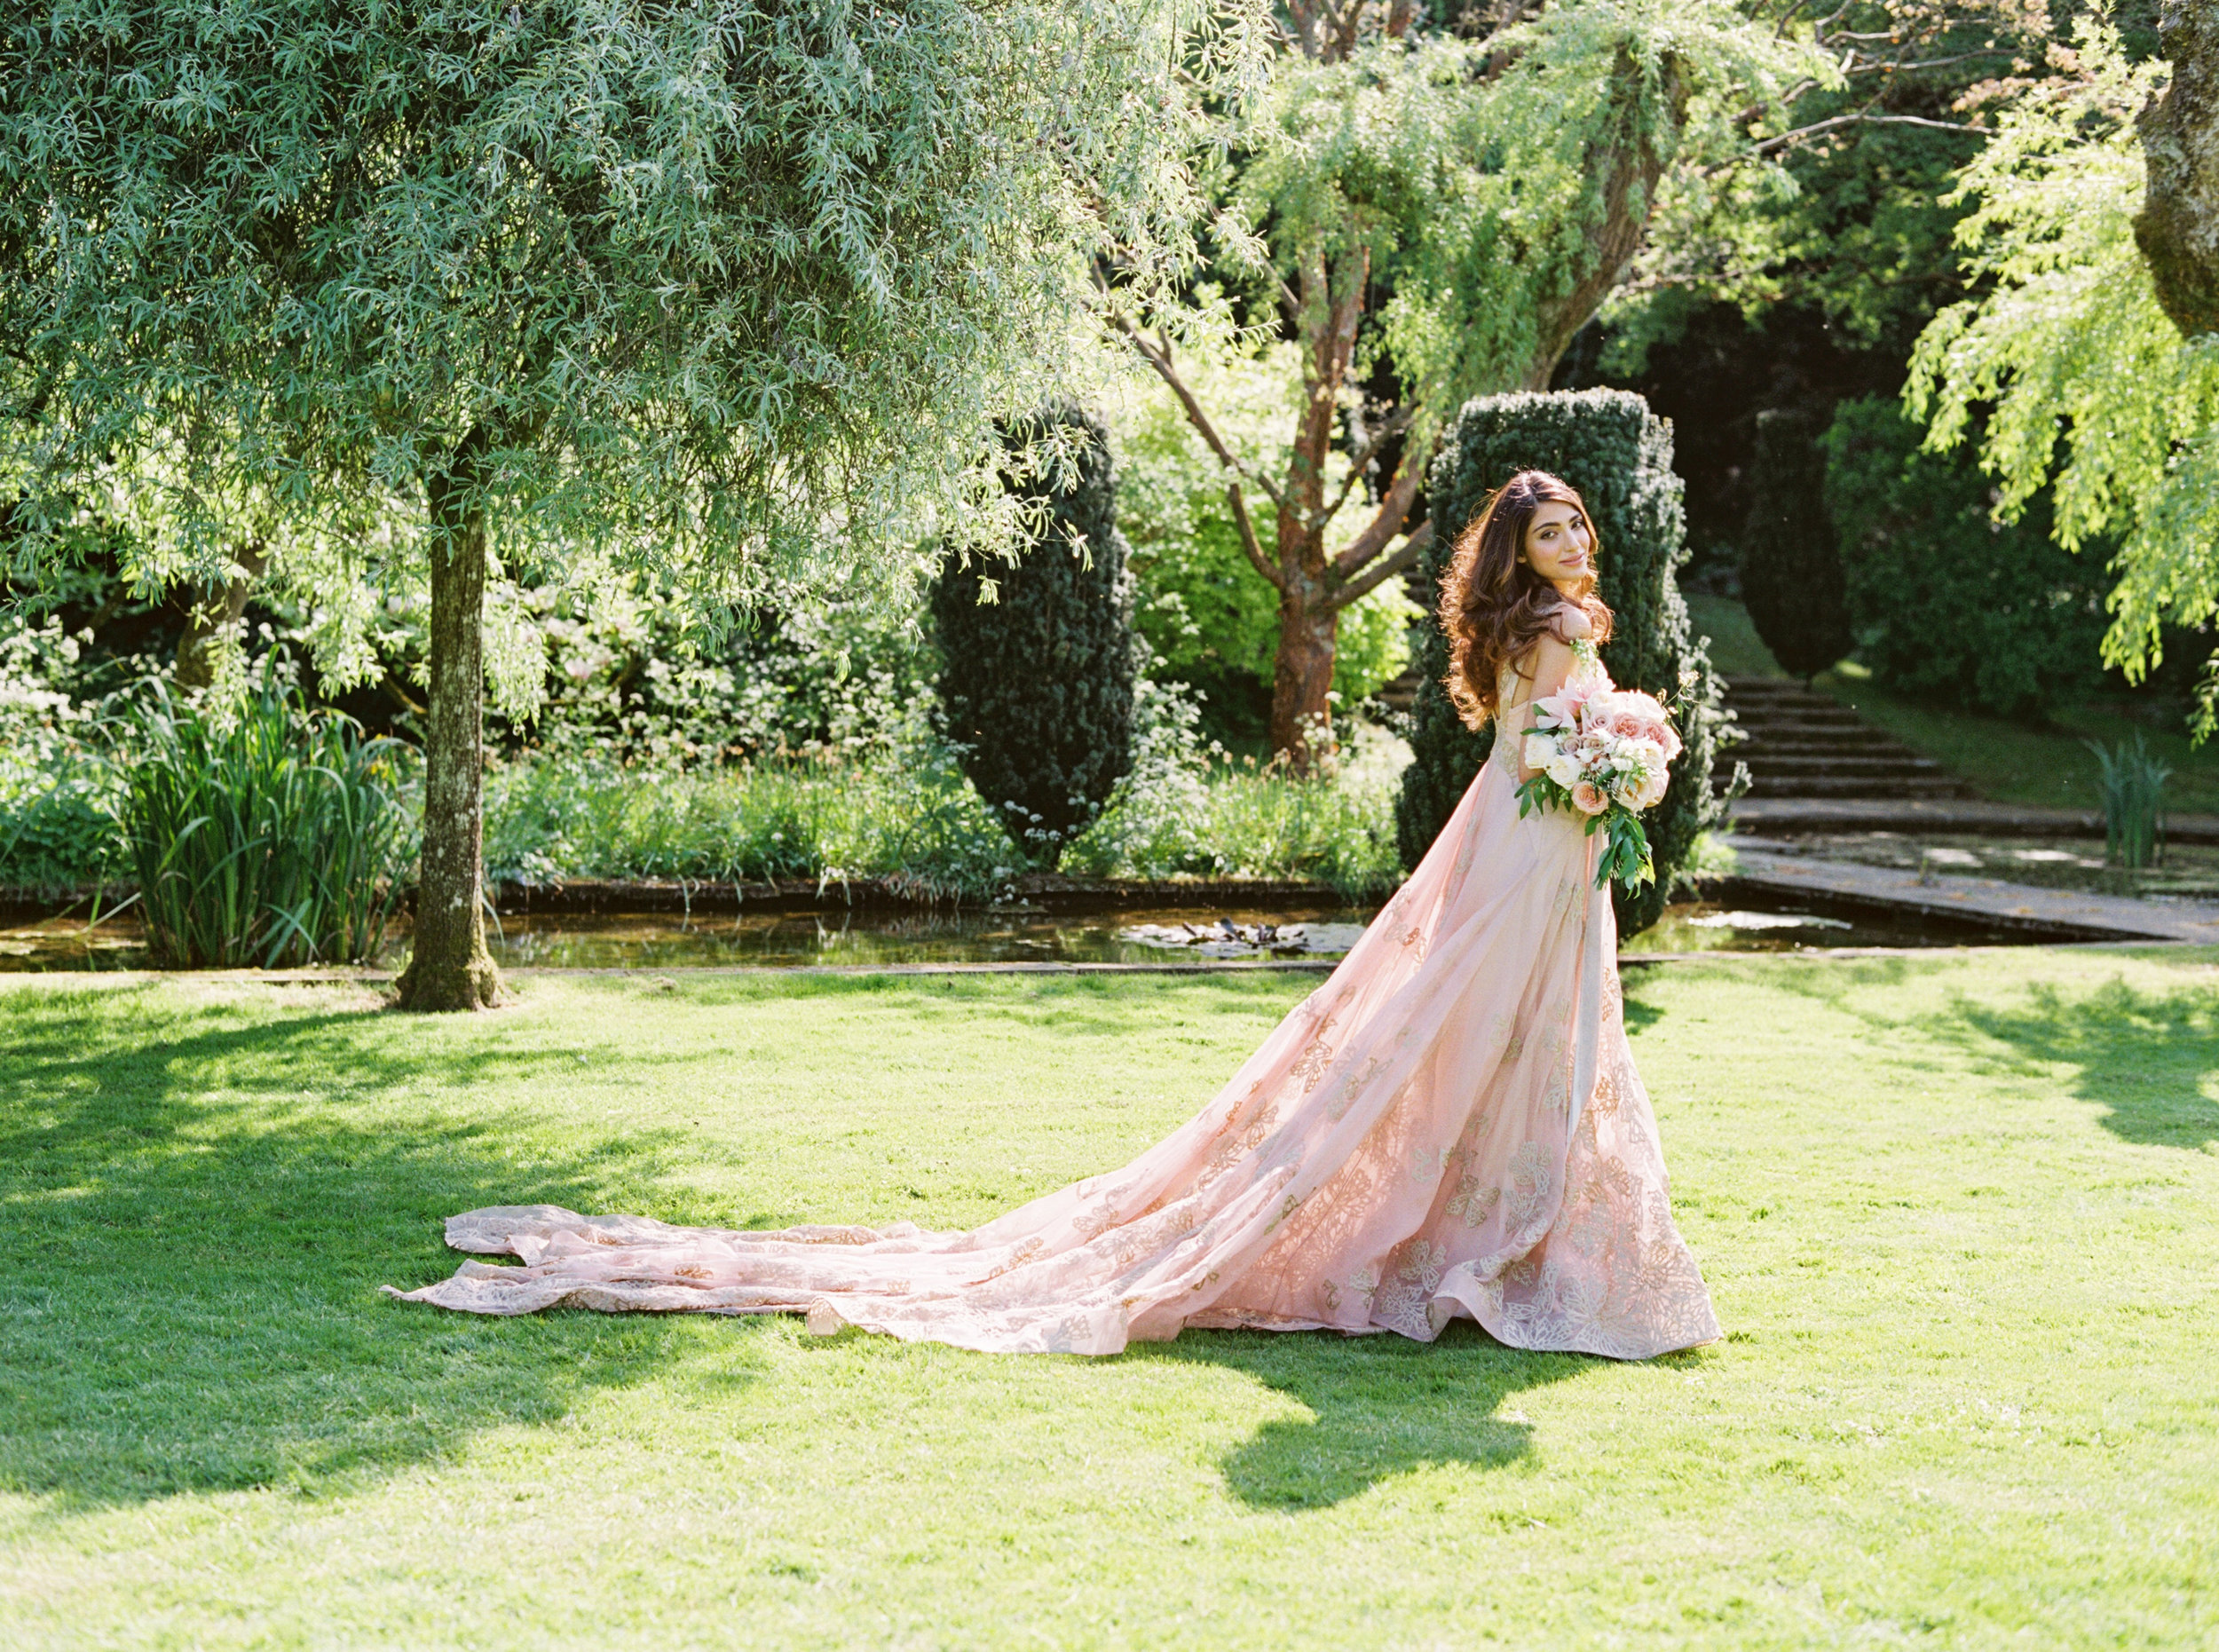 MelissaBlytheFineArtPhotography-CornwellManor_-59.jpg